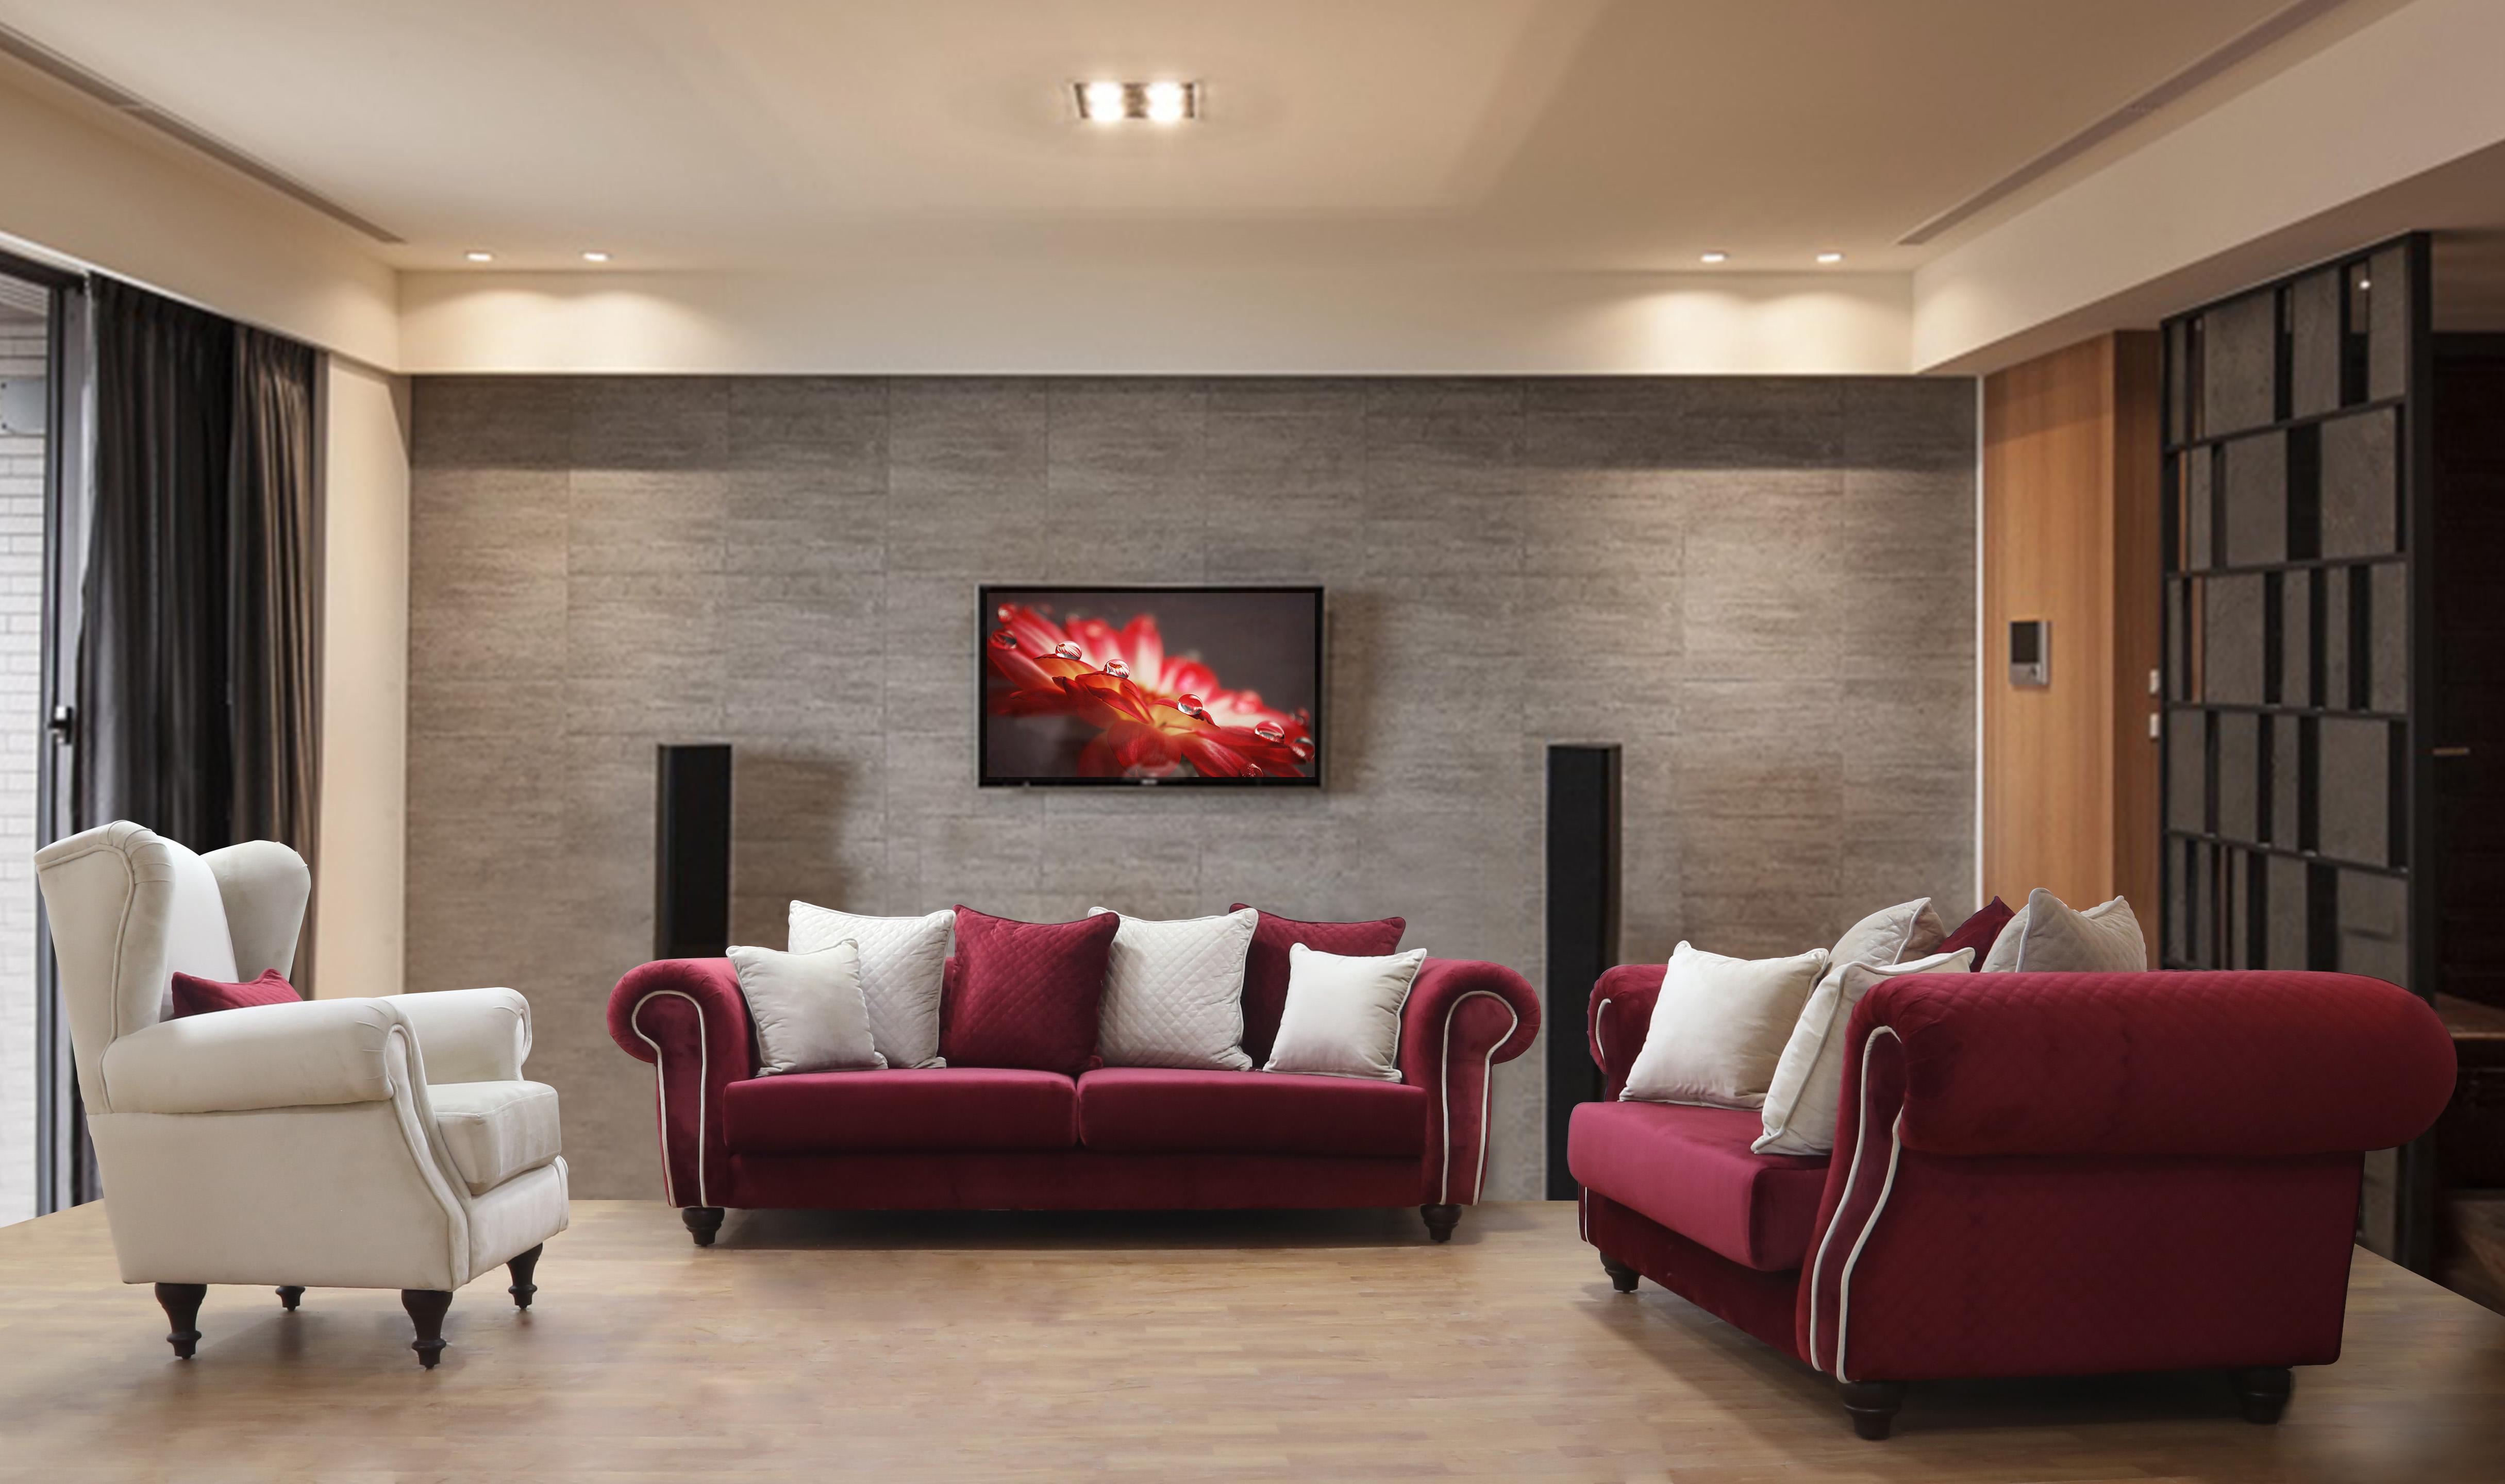 Beauty home gallery furniture beirut lebanon